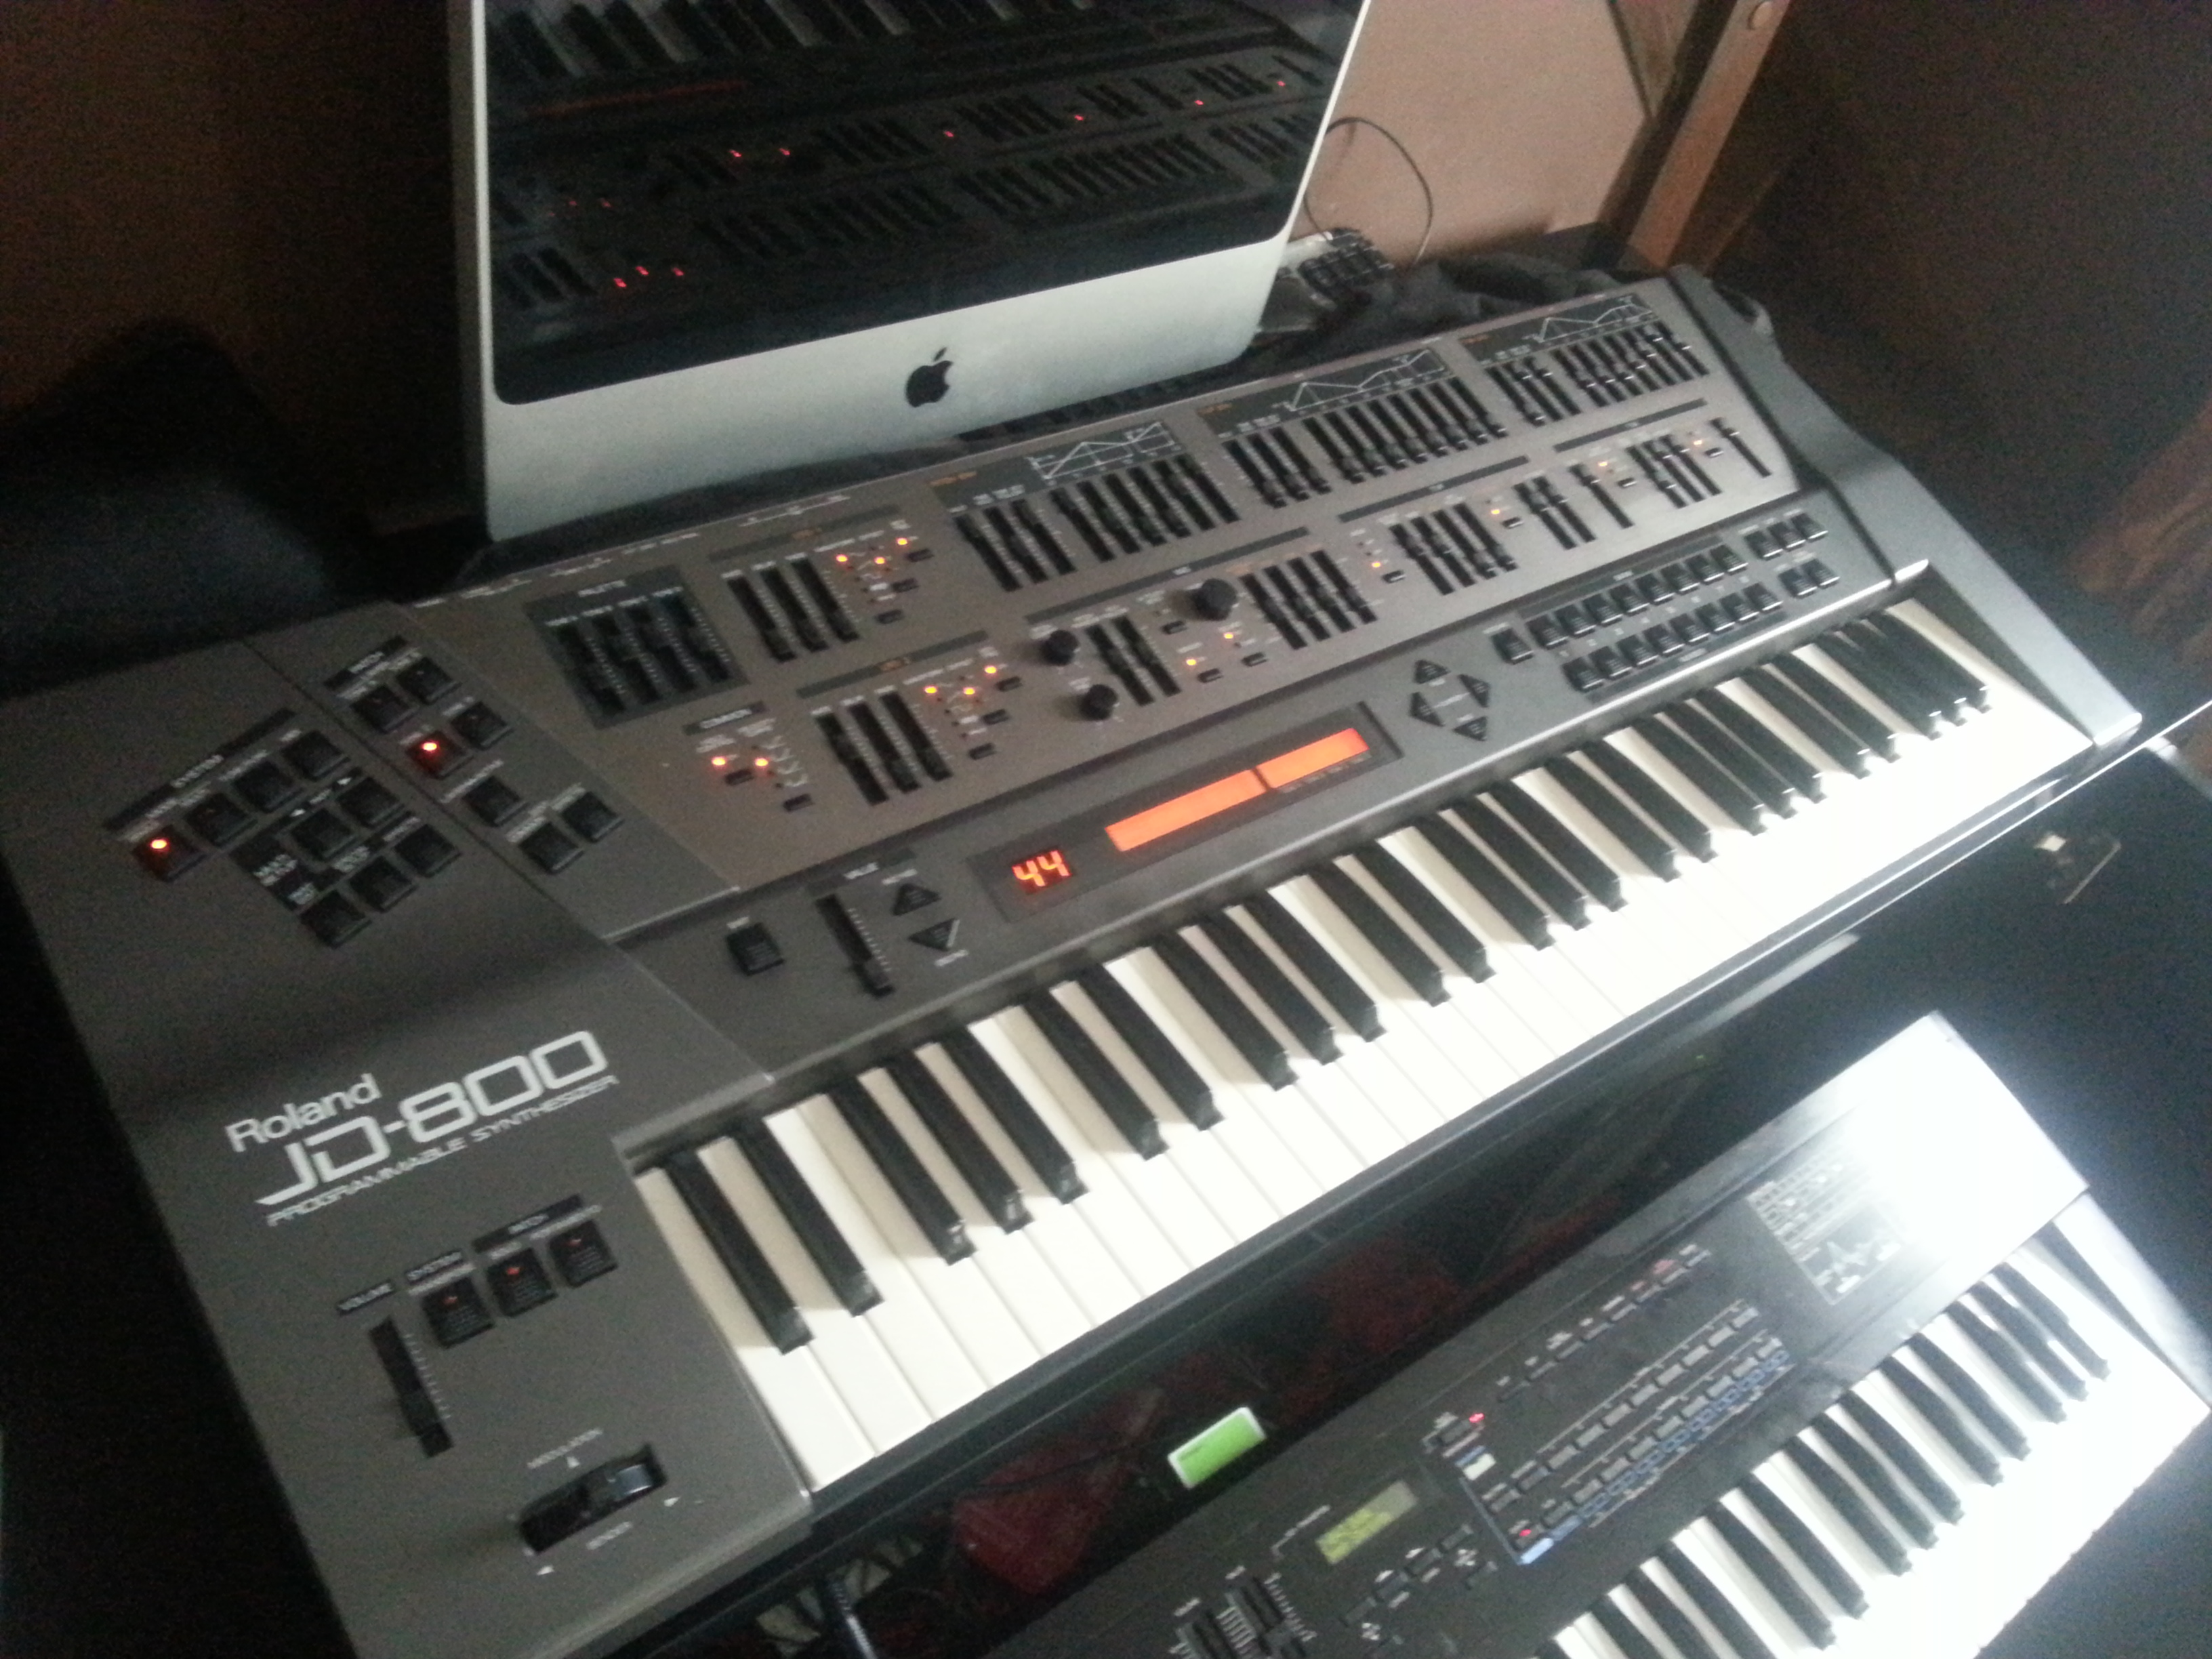 Roland JD-800 image (#1615777) - Audiofanzine